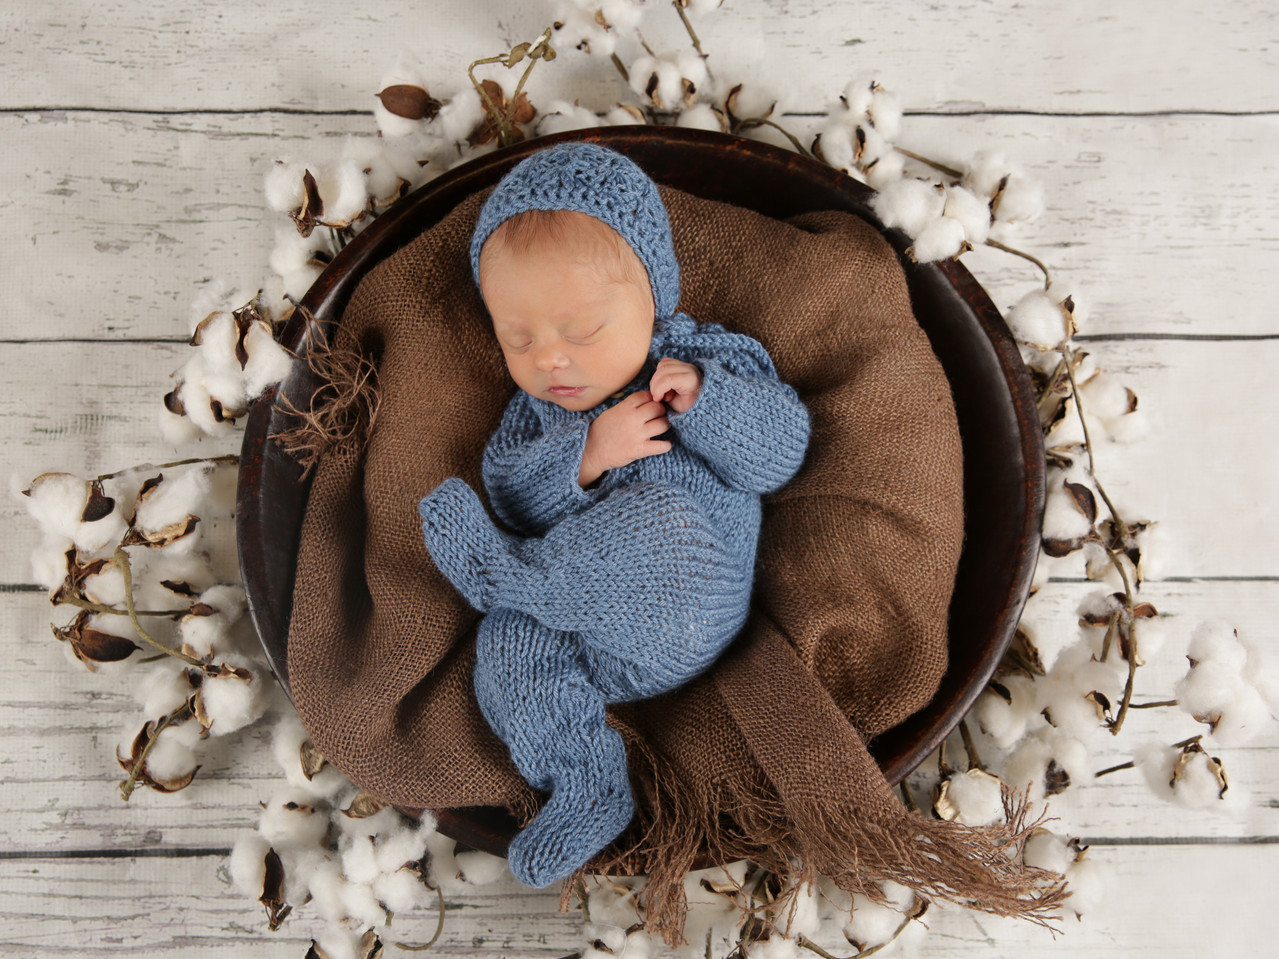 Newborn photographer Las Vegas, MBF